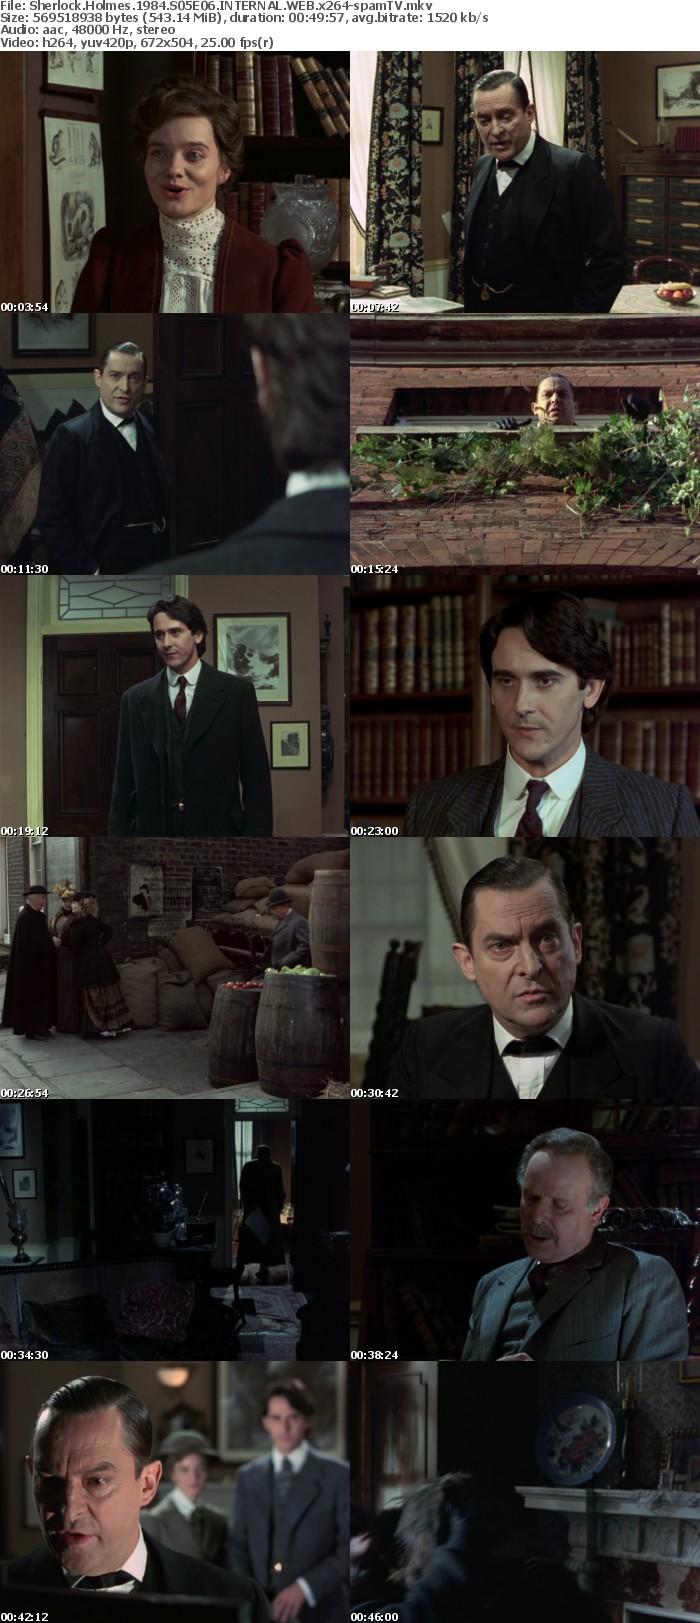 Sherlock Holmes 1984 S05E06 INTERNAL WEB x264-spamTV